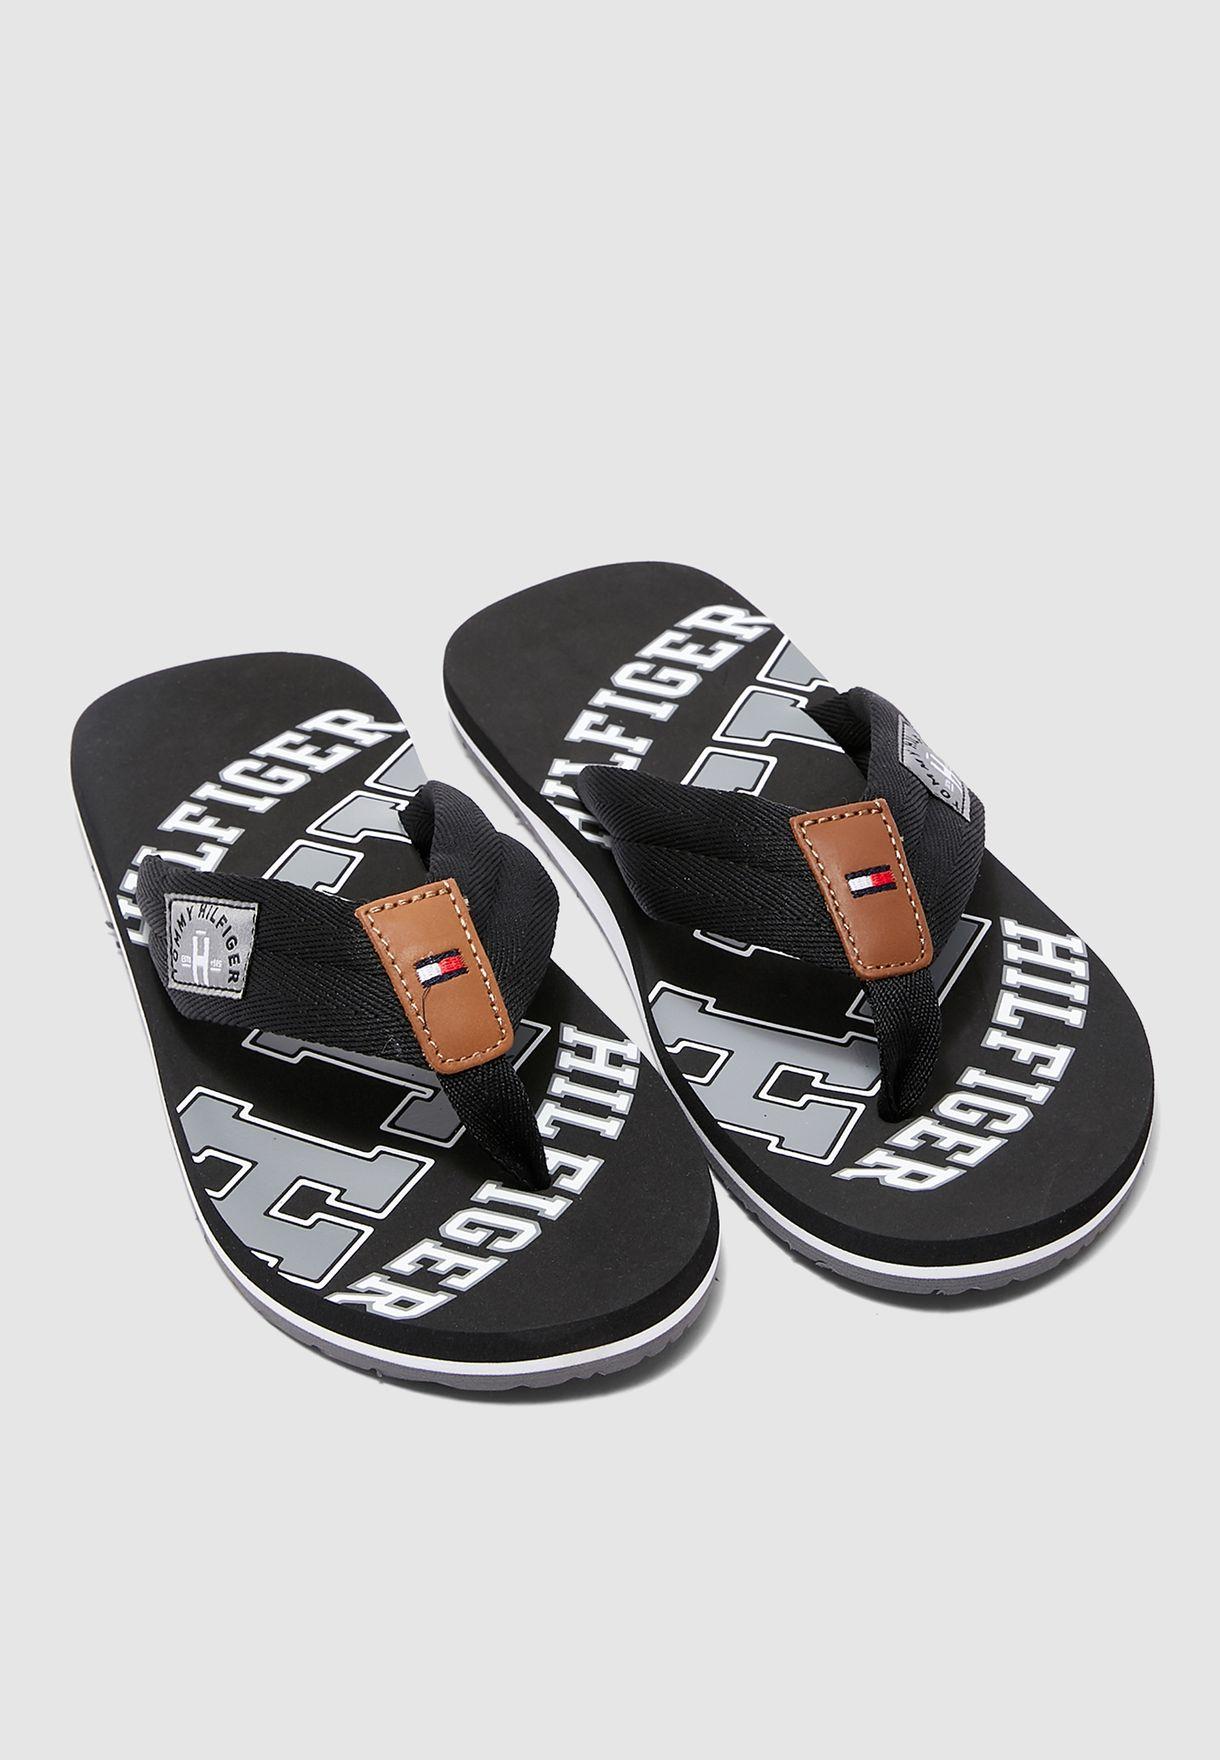 Essential Beach Flip Flops